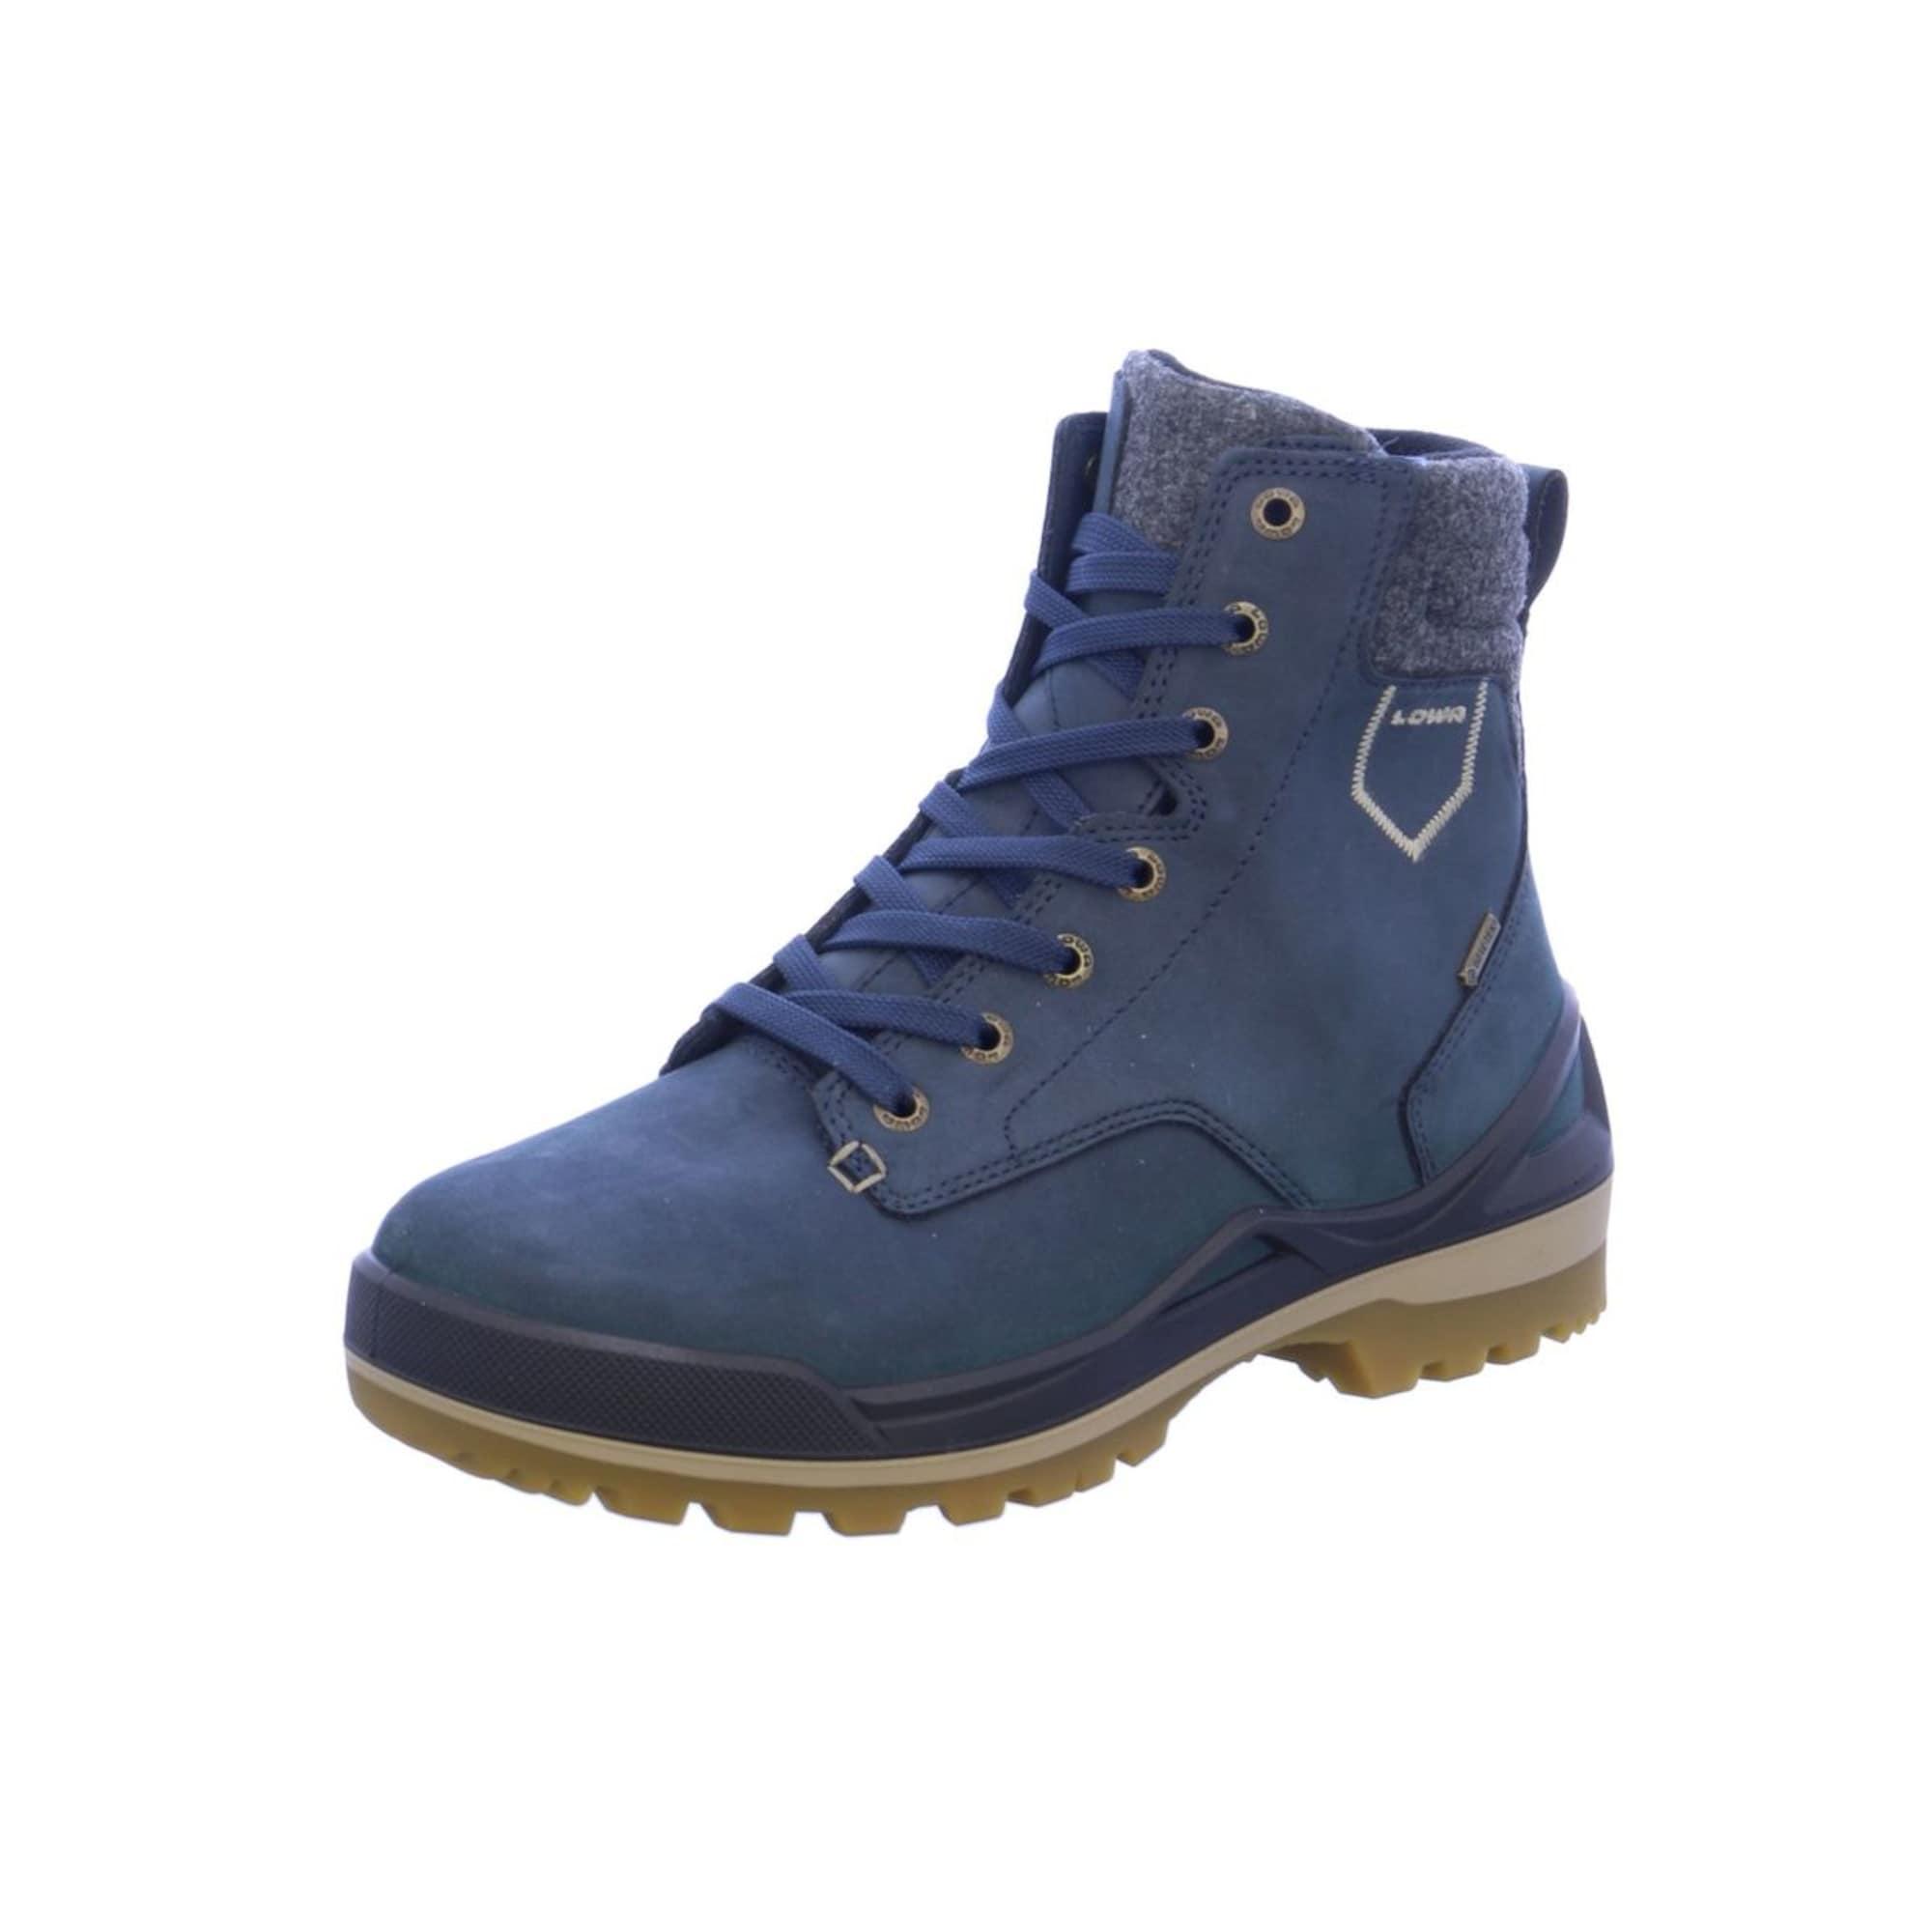 Stiefel | Schuhe > Boots > Stiefel | LOWA